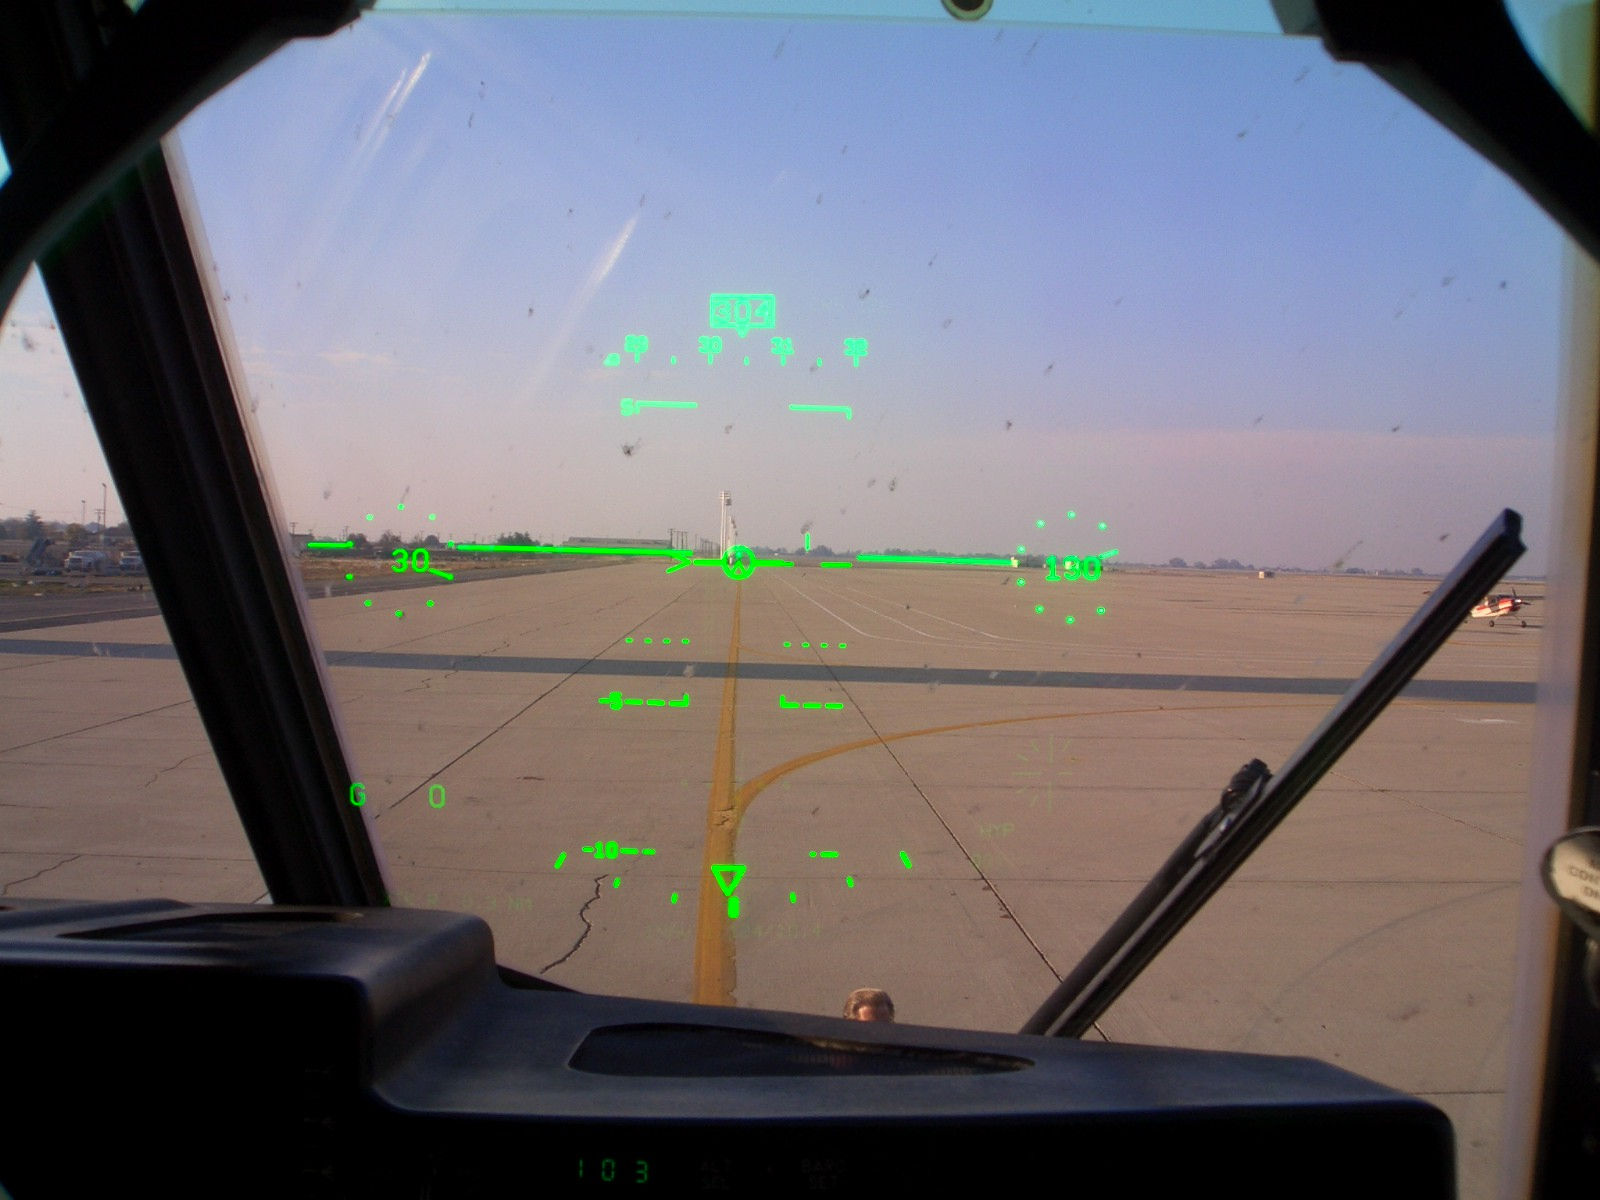 File:C 130J_Co_Pilot's_Head Up_display on Transparent Fighter Plane